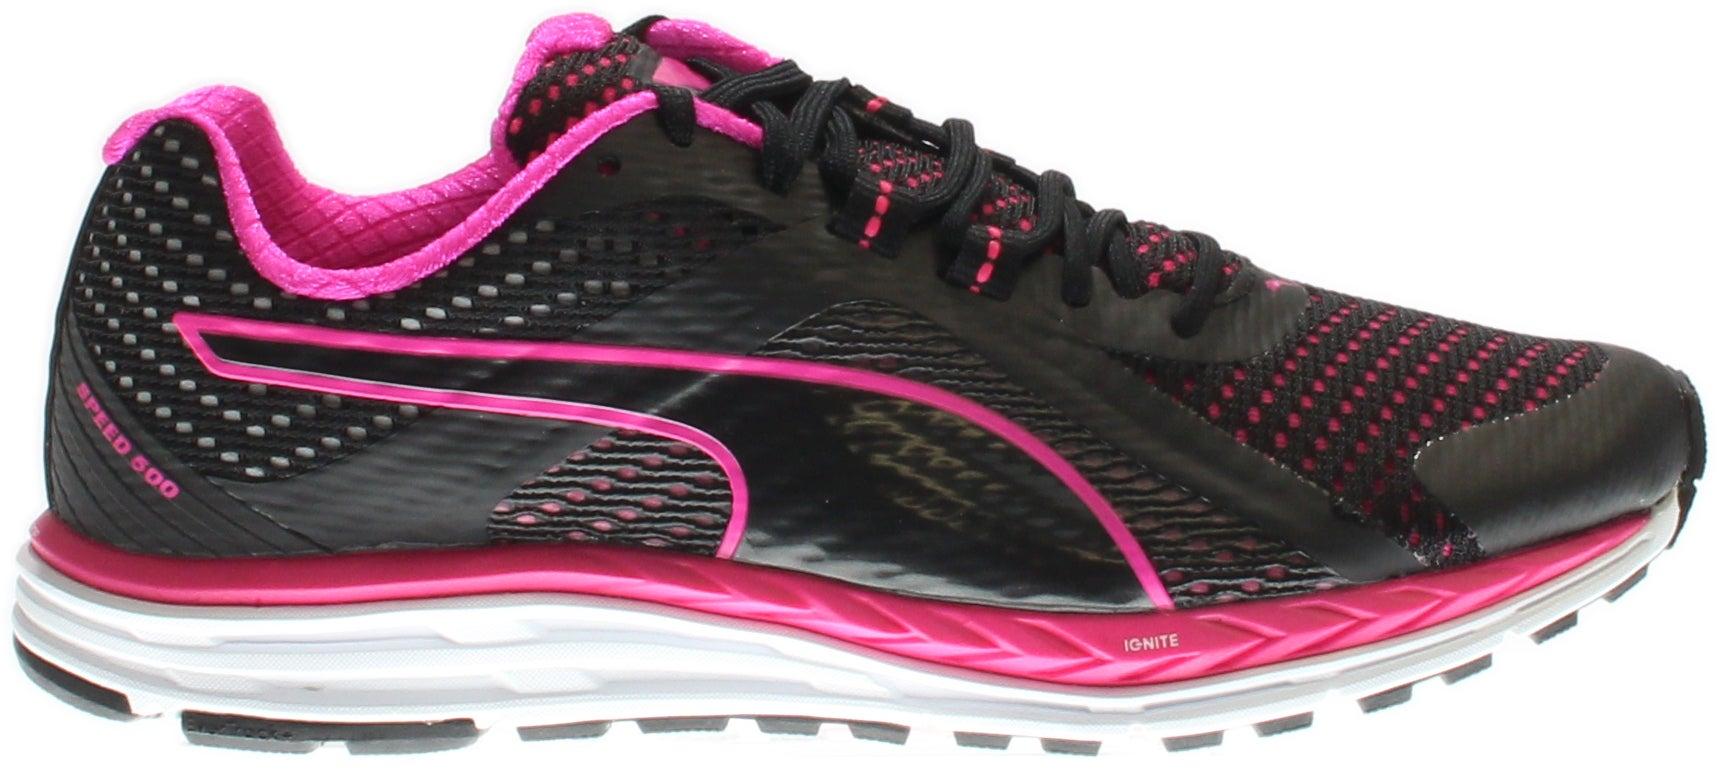 Puma Speed 500 IGNITE Women's Running Shoes Black - Womens  - Size 10.5